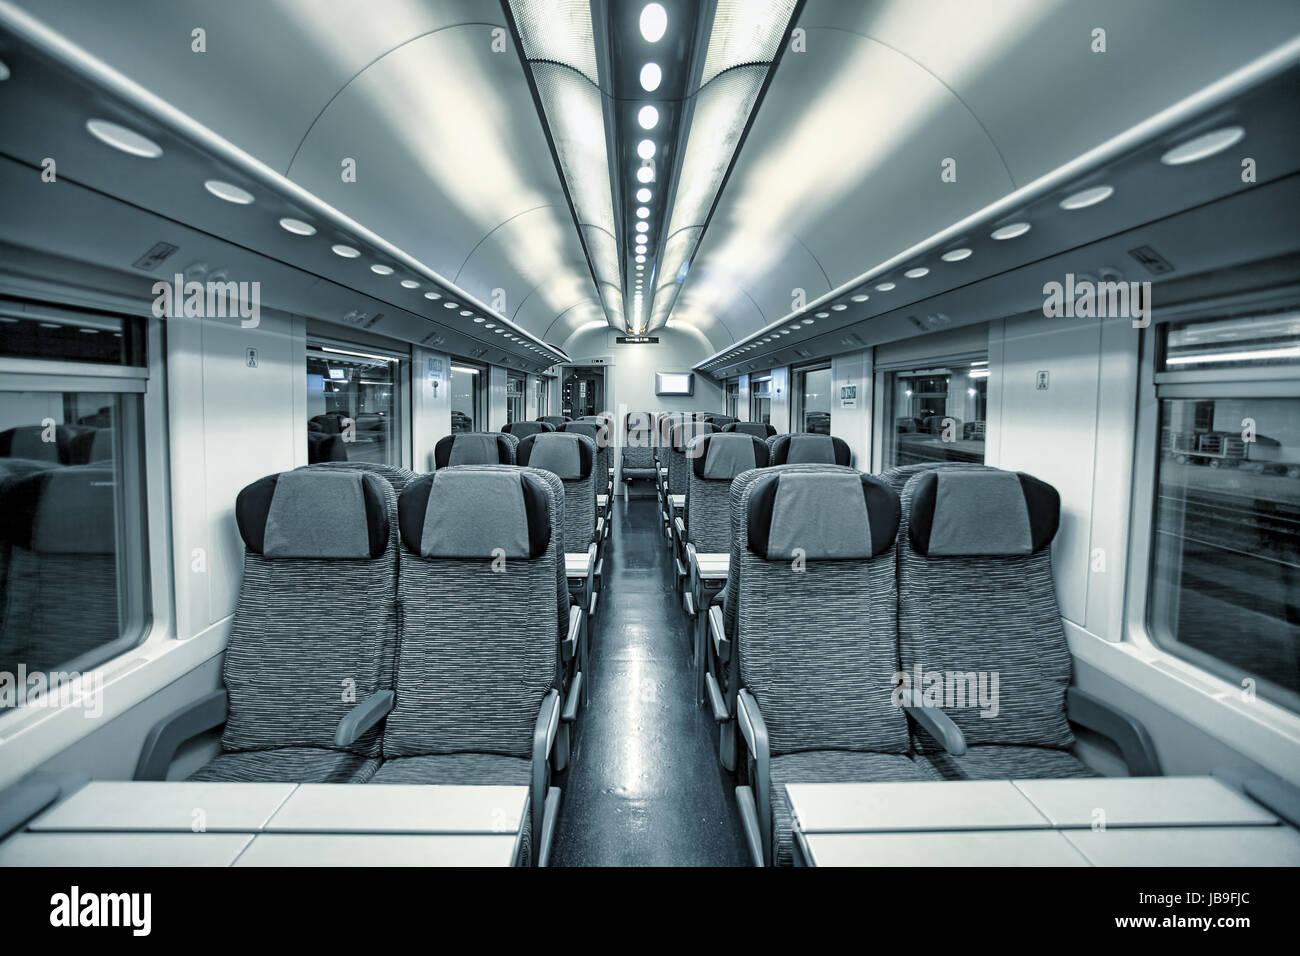 Intercity Coach Stock Photos & Intercity Coach Stock Images - Alamy